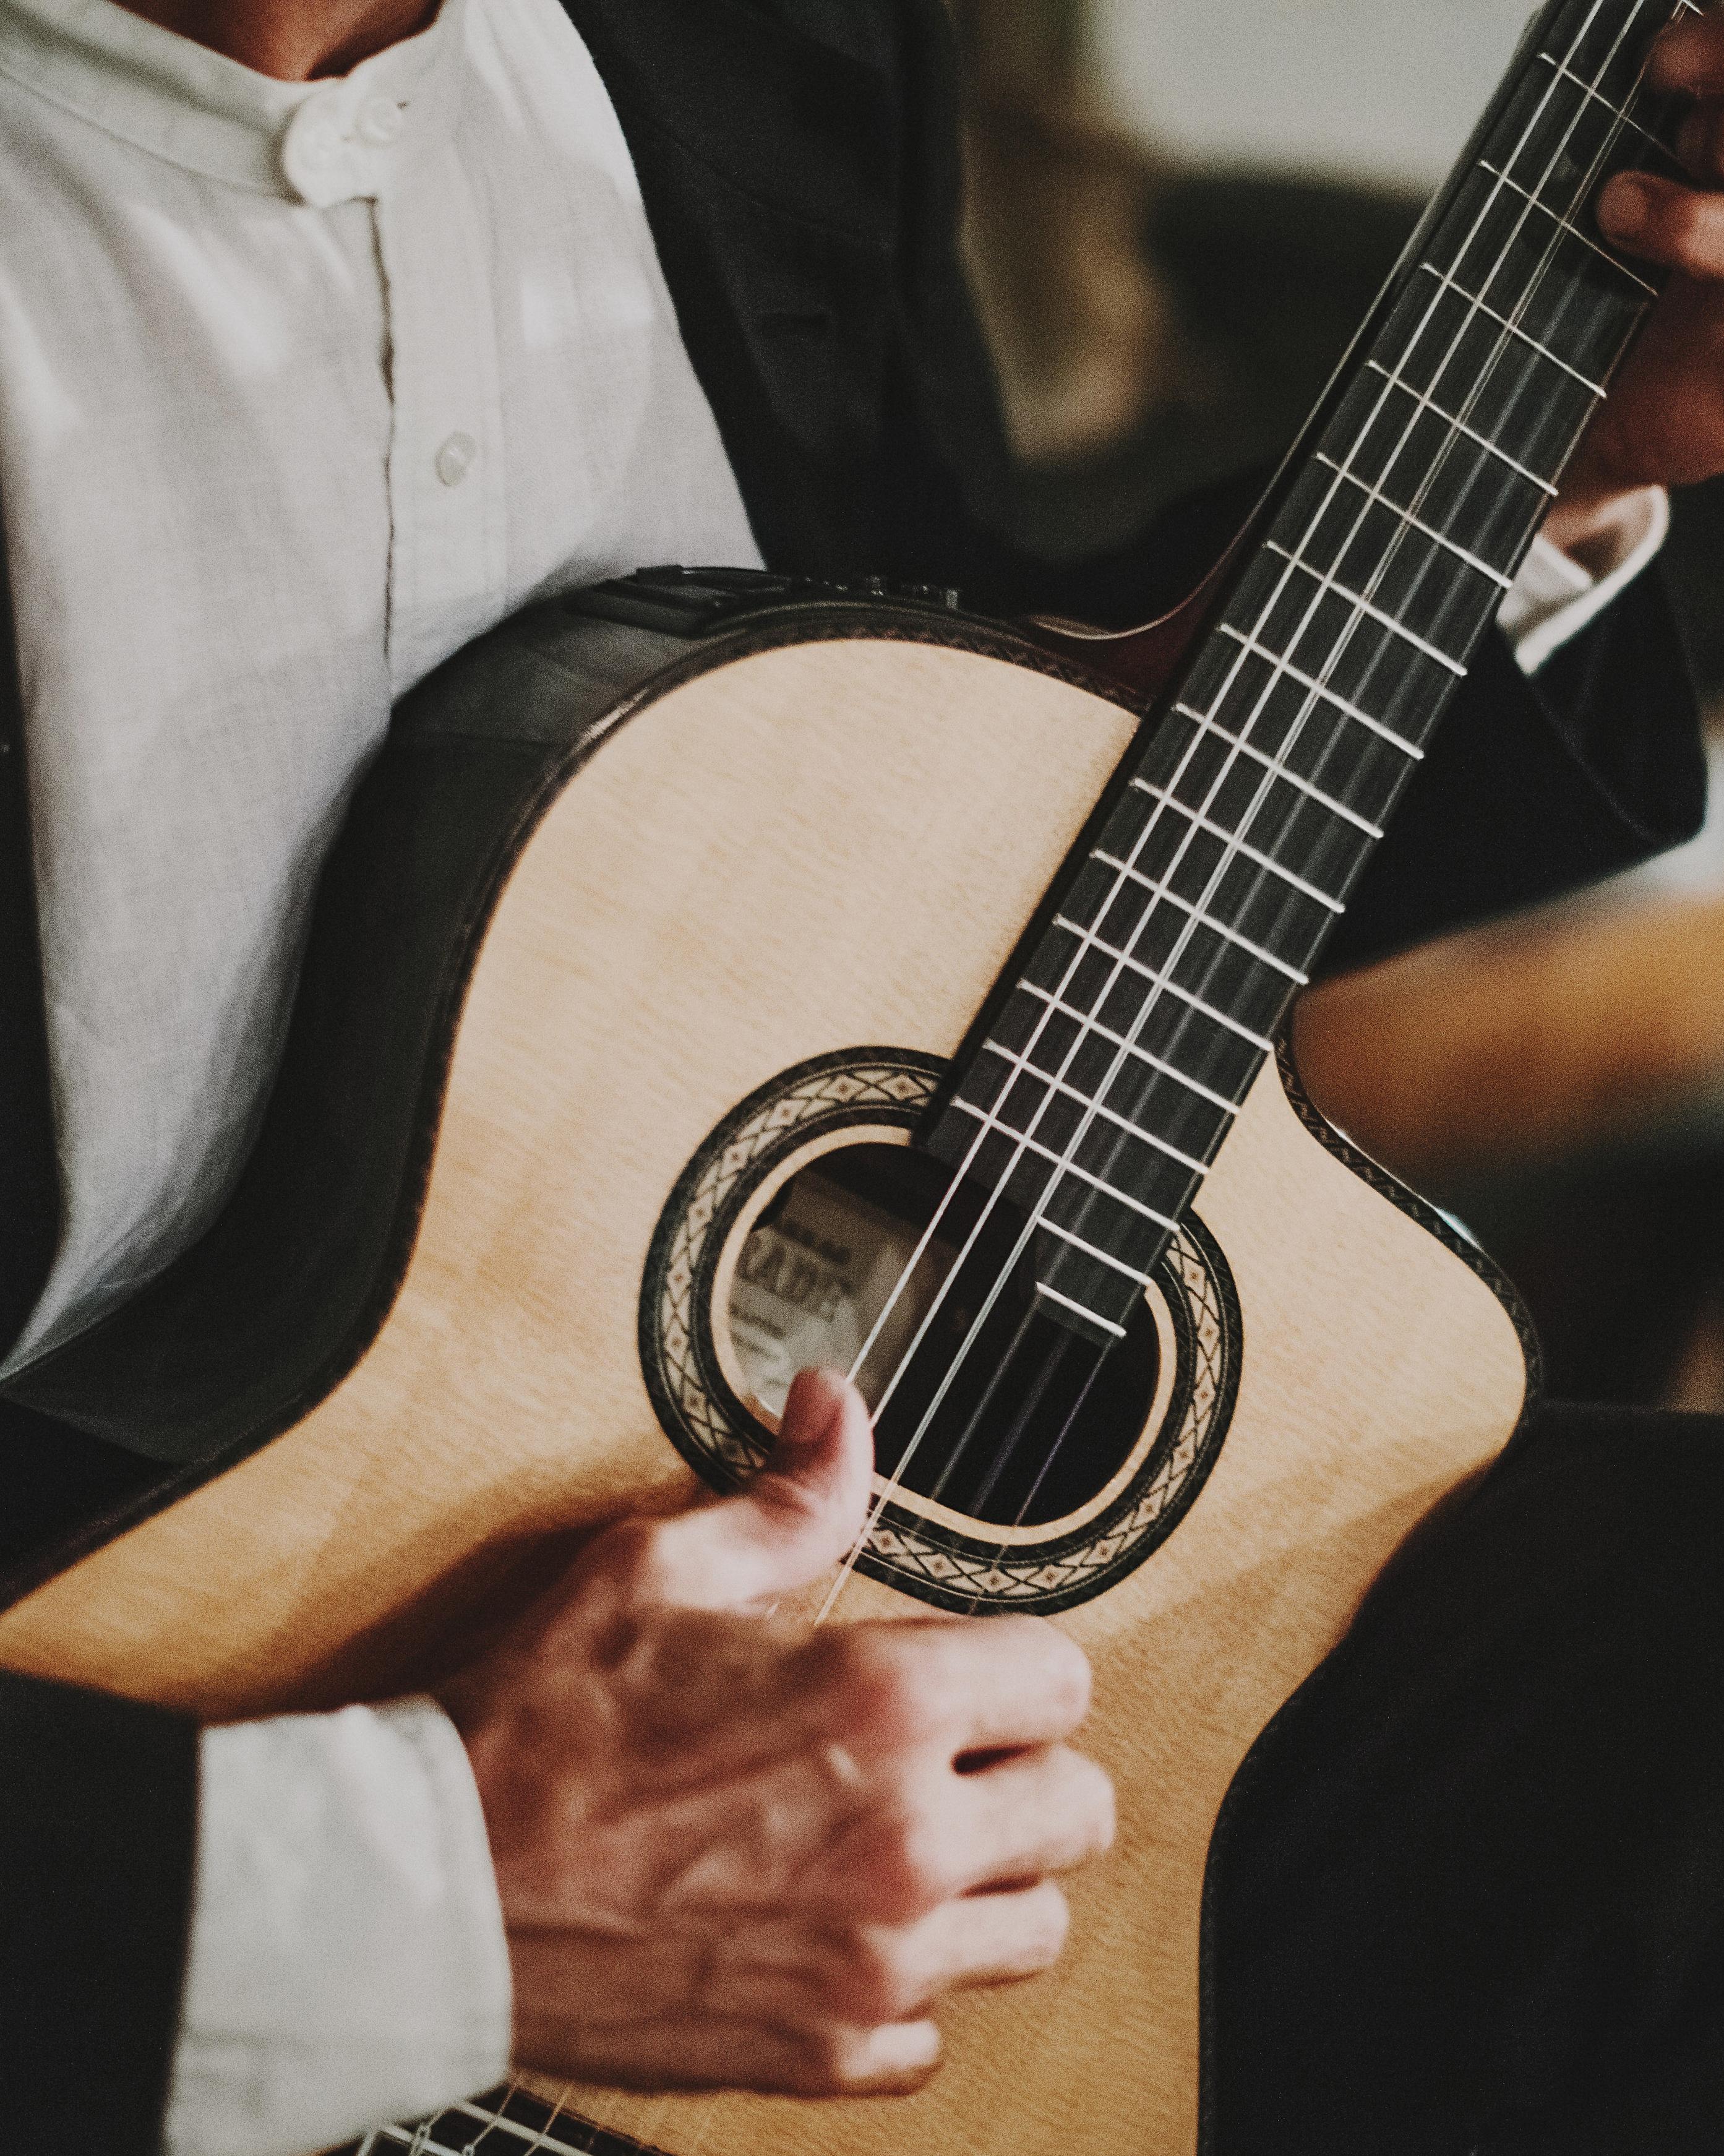 tamara-brett-wedding-guitar-1294-s112120-0915.jpg